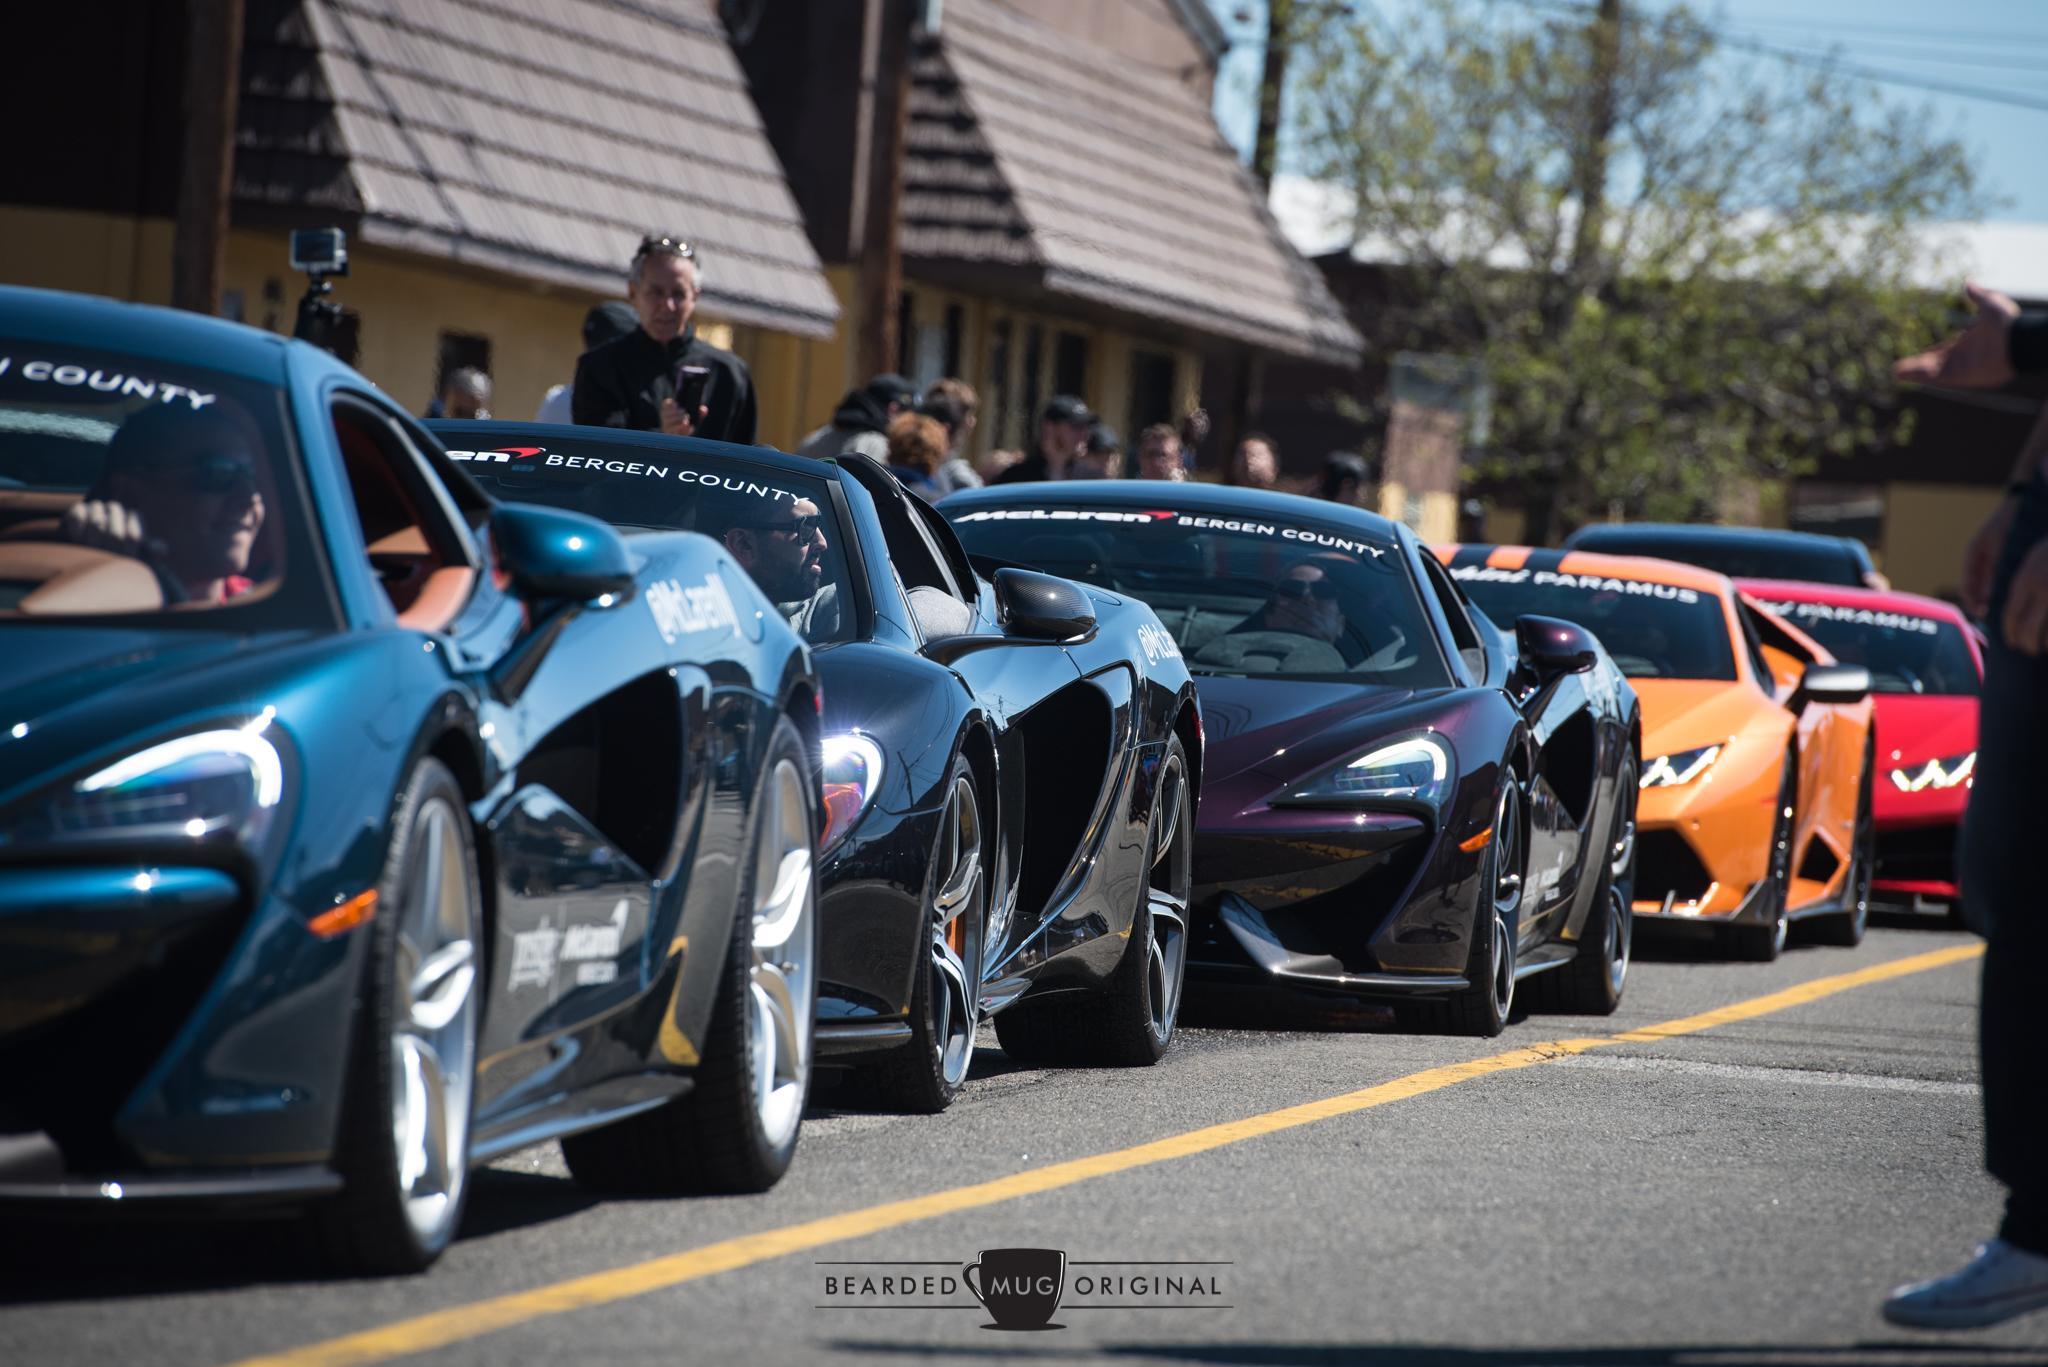 McLaren Bergen County & Lamborghini Paramus, both Prestige dealerships, represented their respective brands proudly.